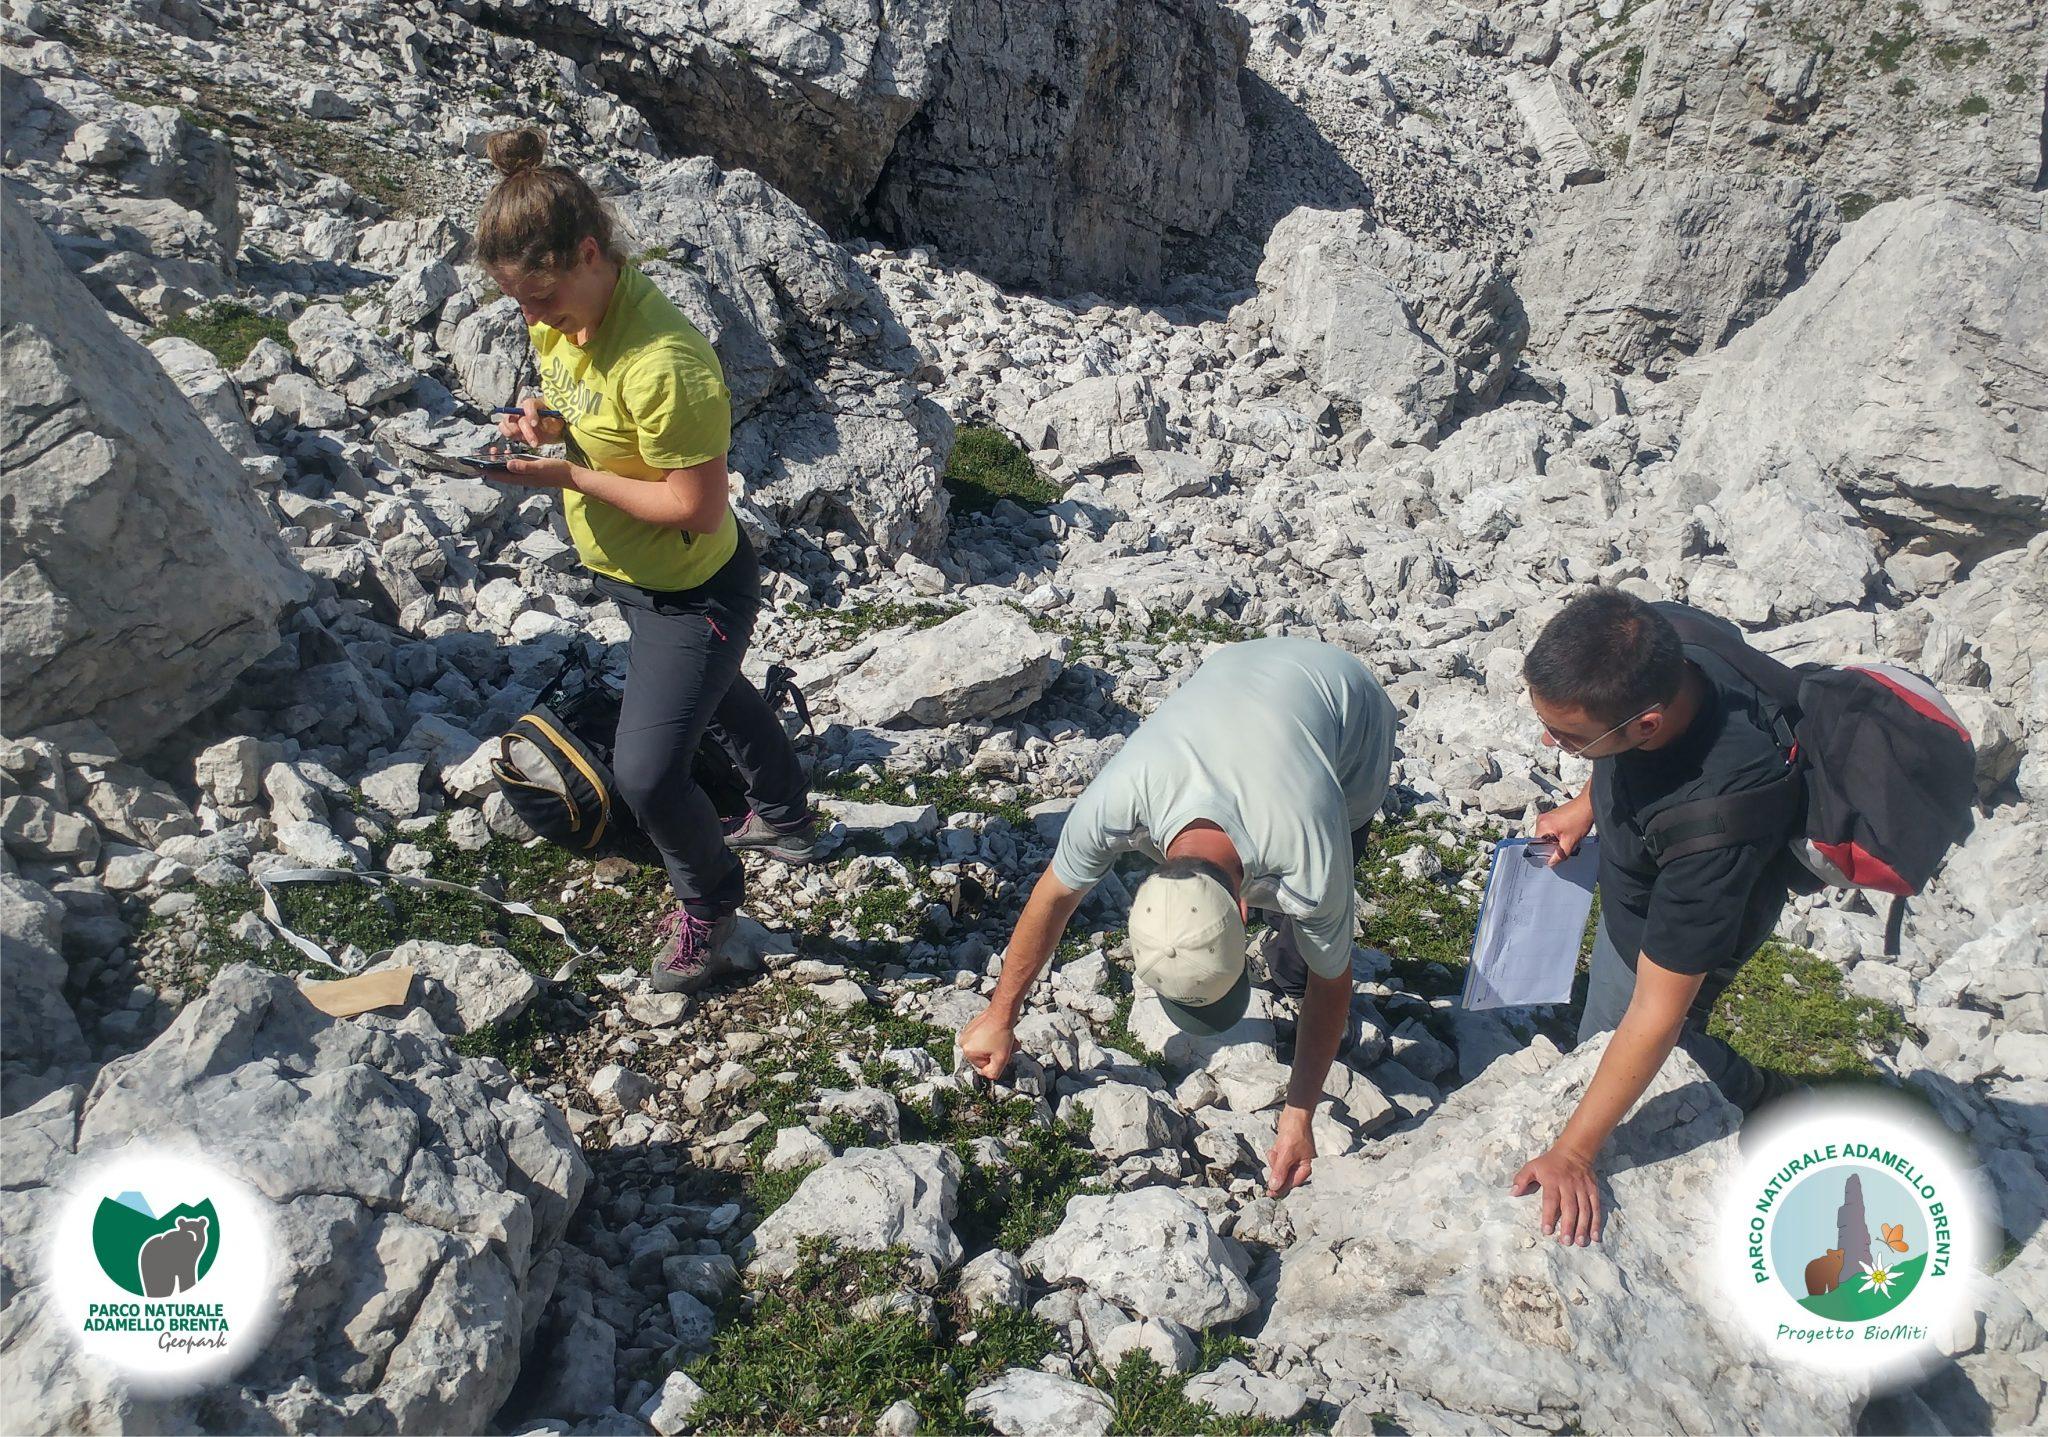 Progetti geologici